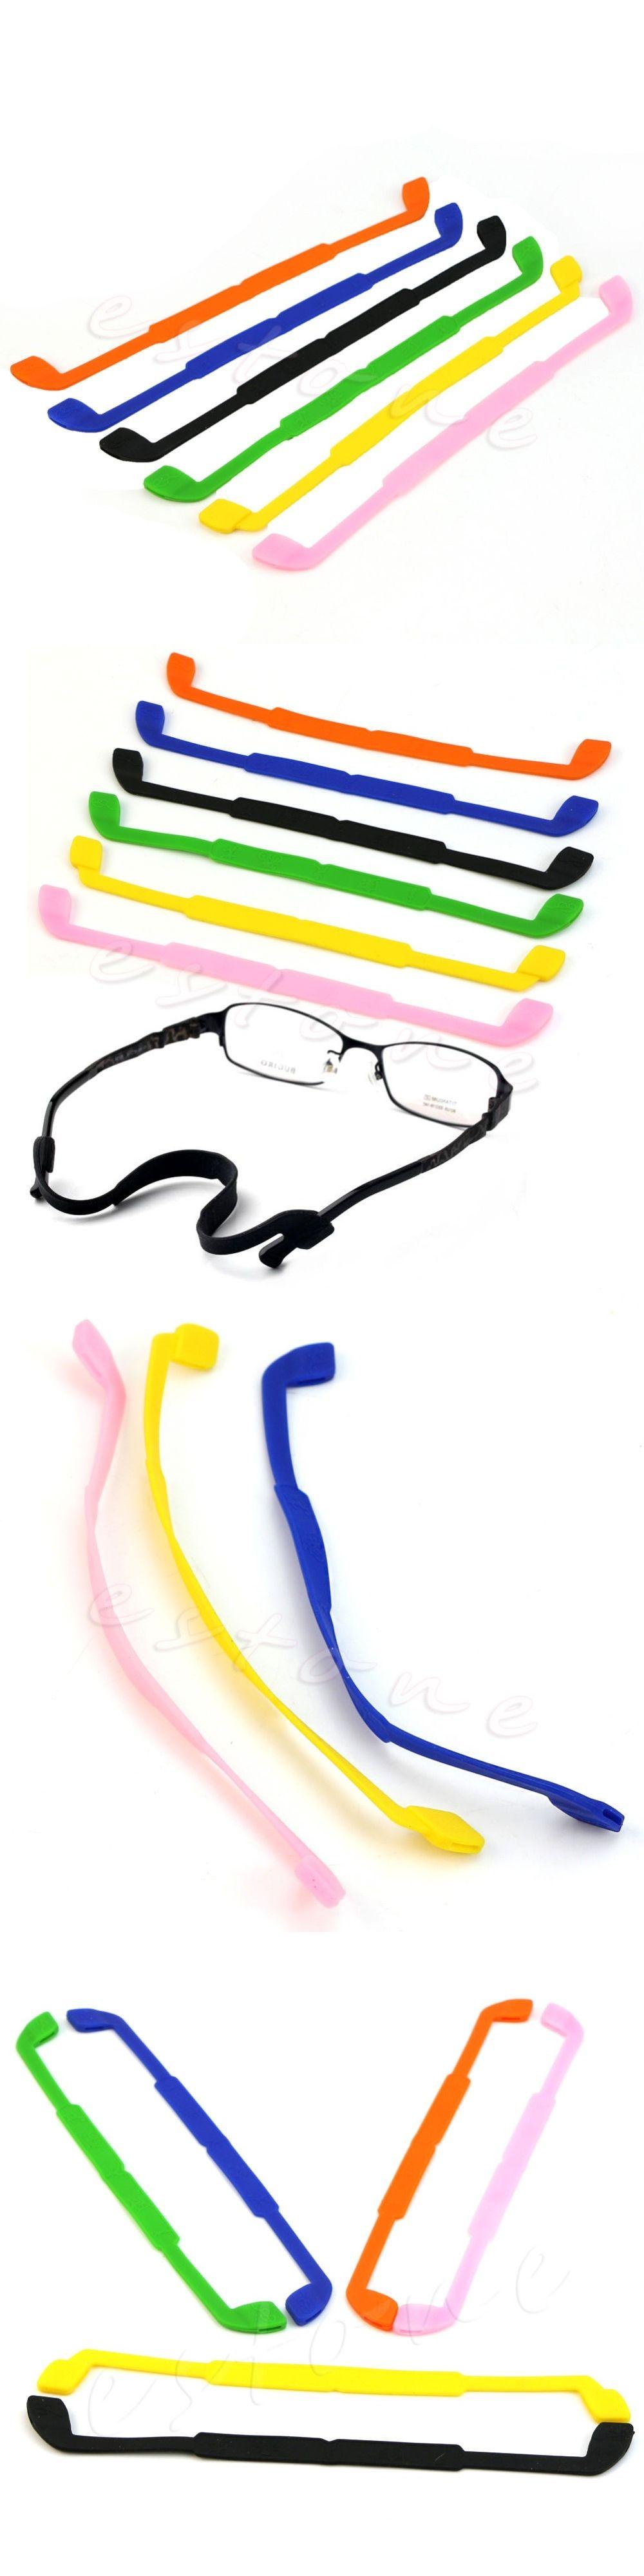 c30828f3ec58 Silicone Eyeglasses Glasses Sunglasses Strap Sports Band Cord Holder For  Kids